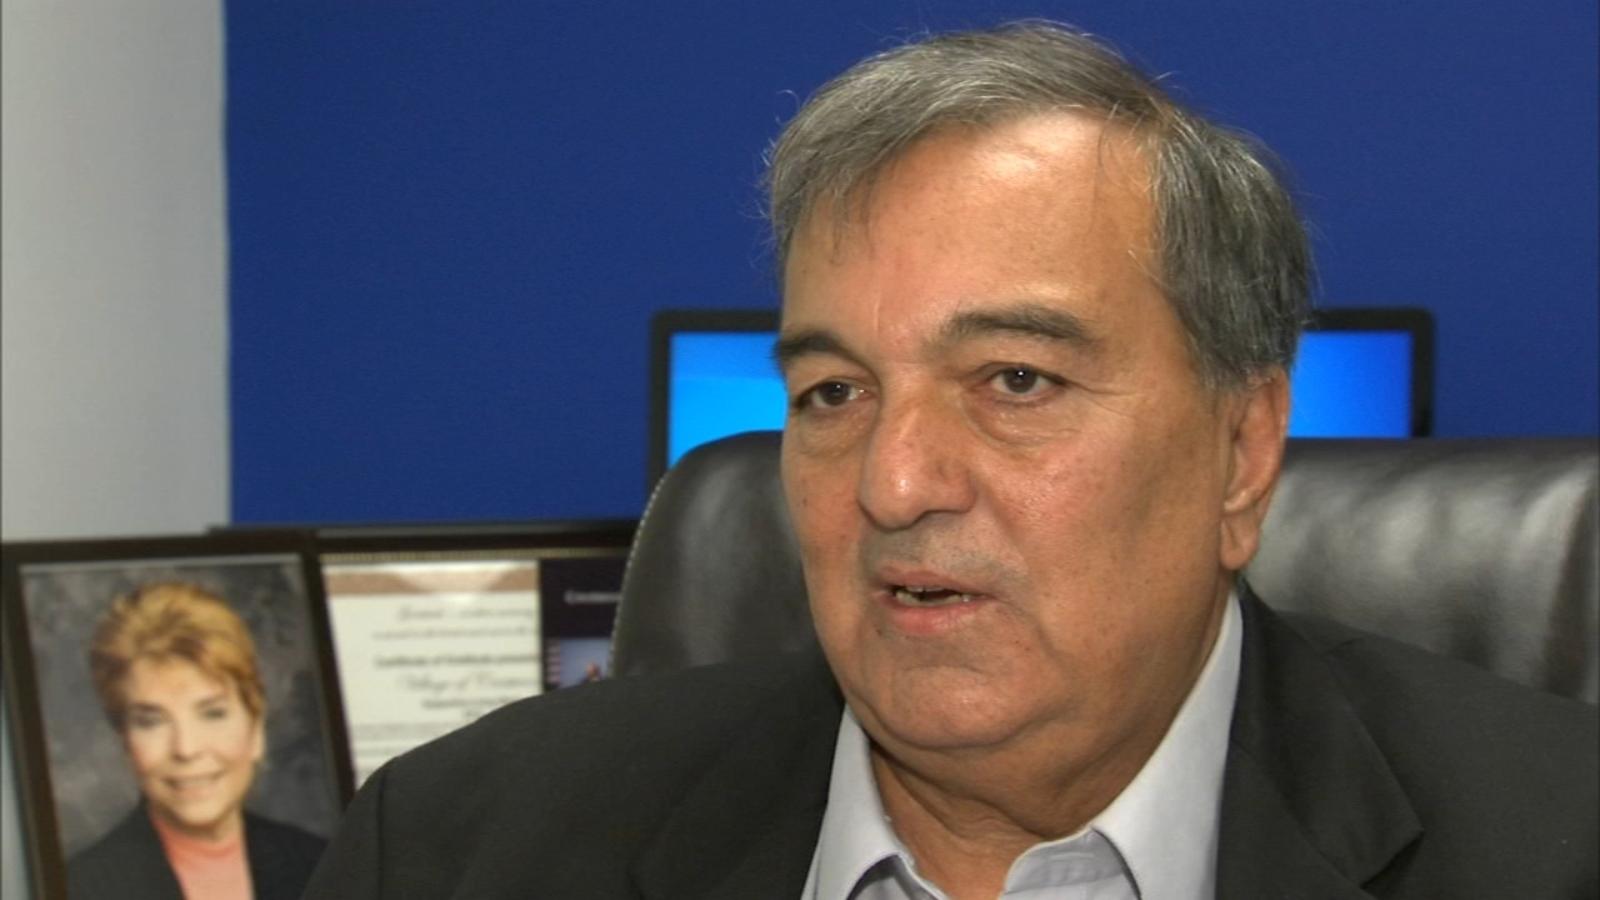 Crestwood mayor charged in red-light camera bribery scheme, false tax return filing